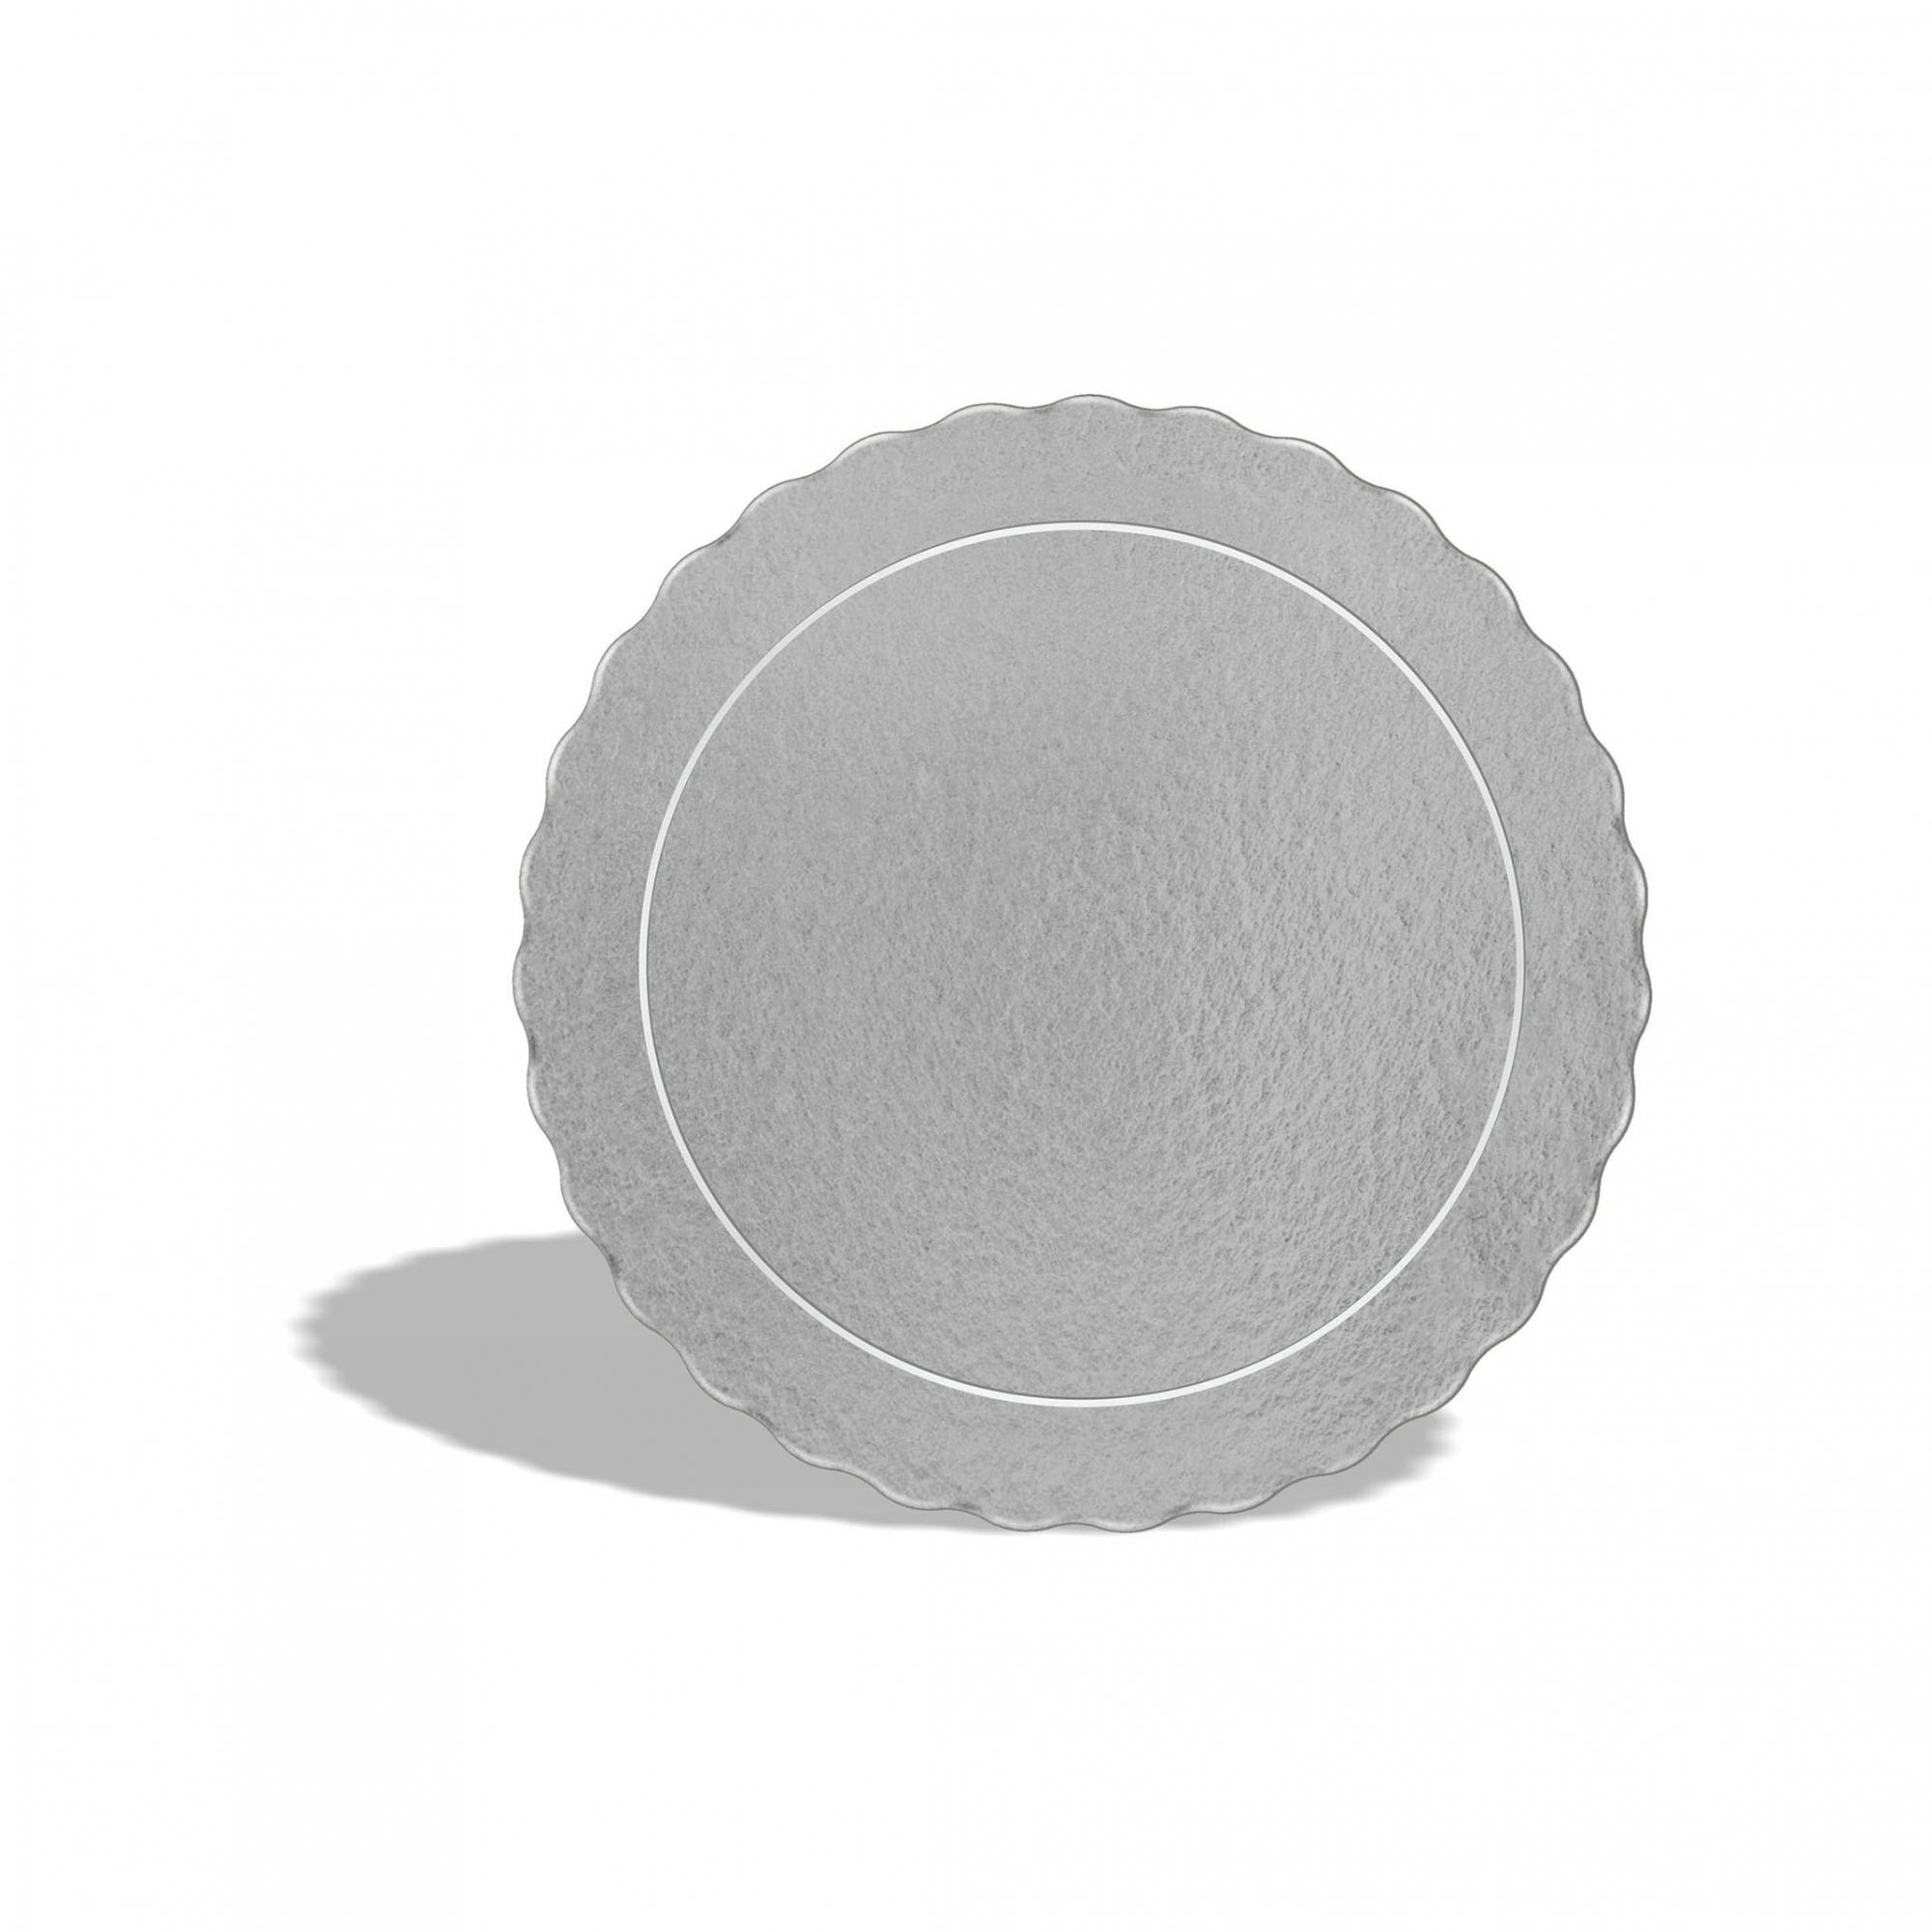 200 Bases Laminadas, Suporte P/ Bolo, Cake Board, 25cm - Prata